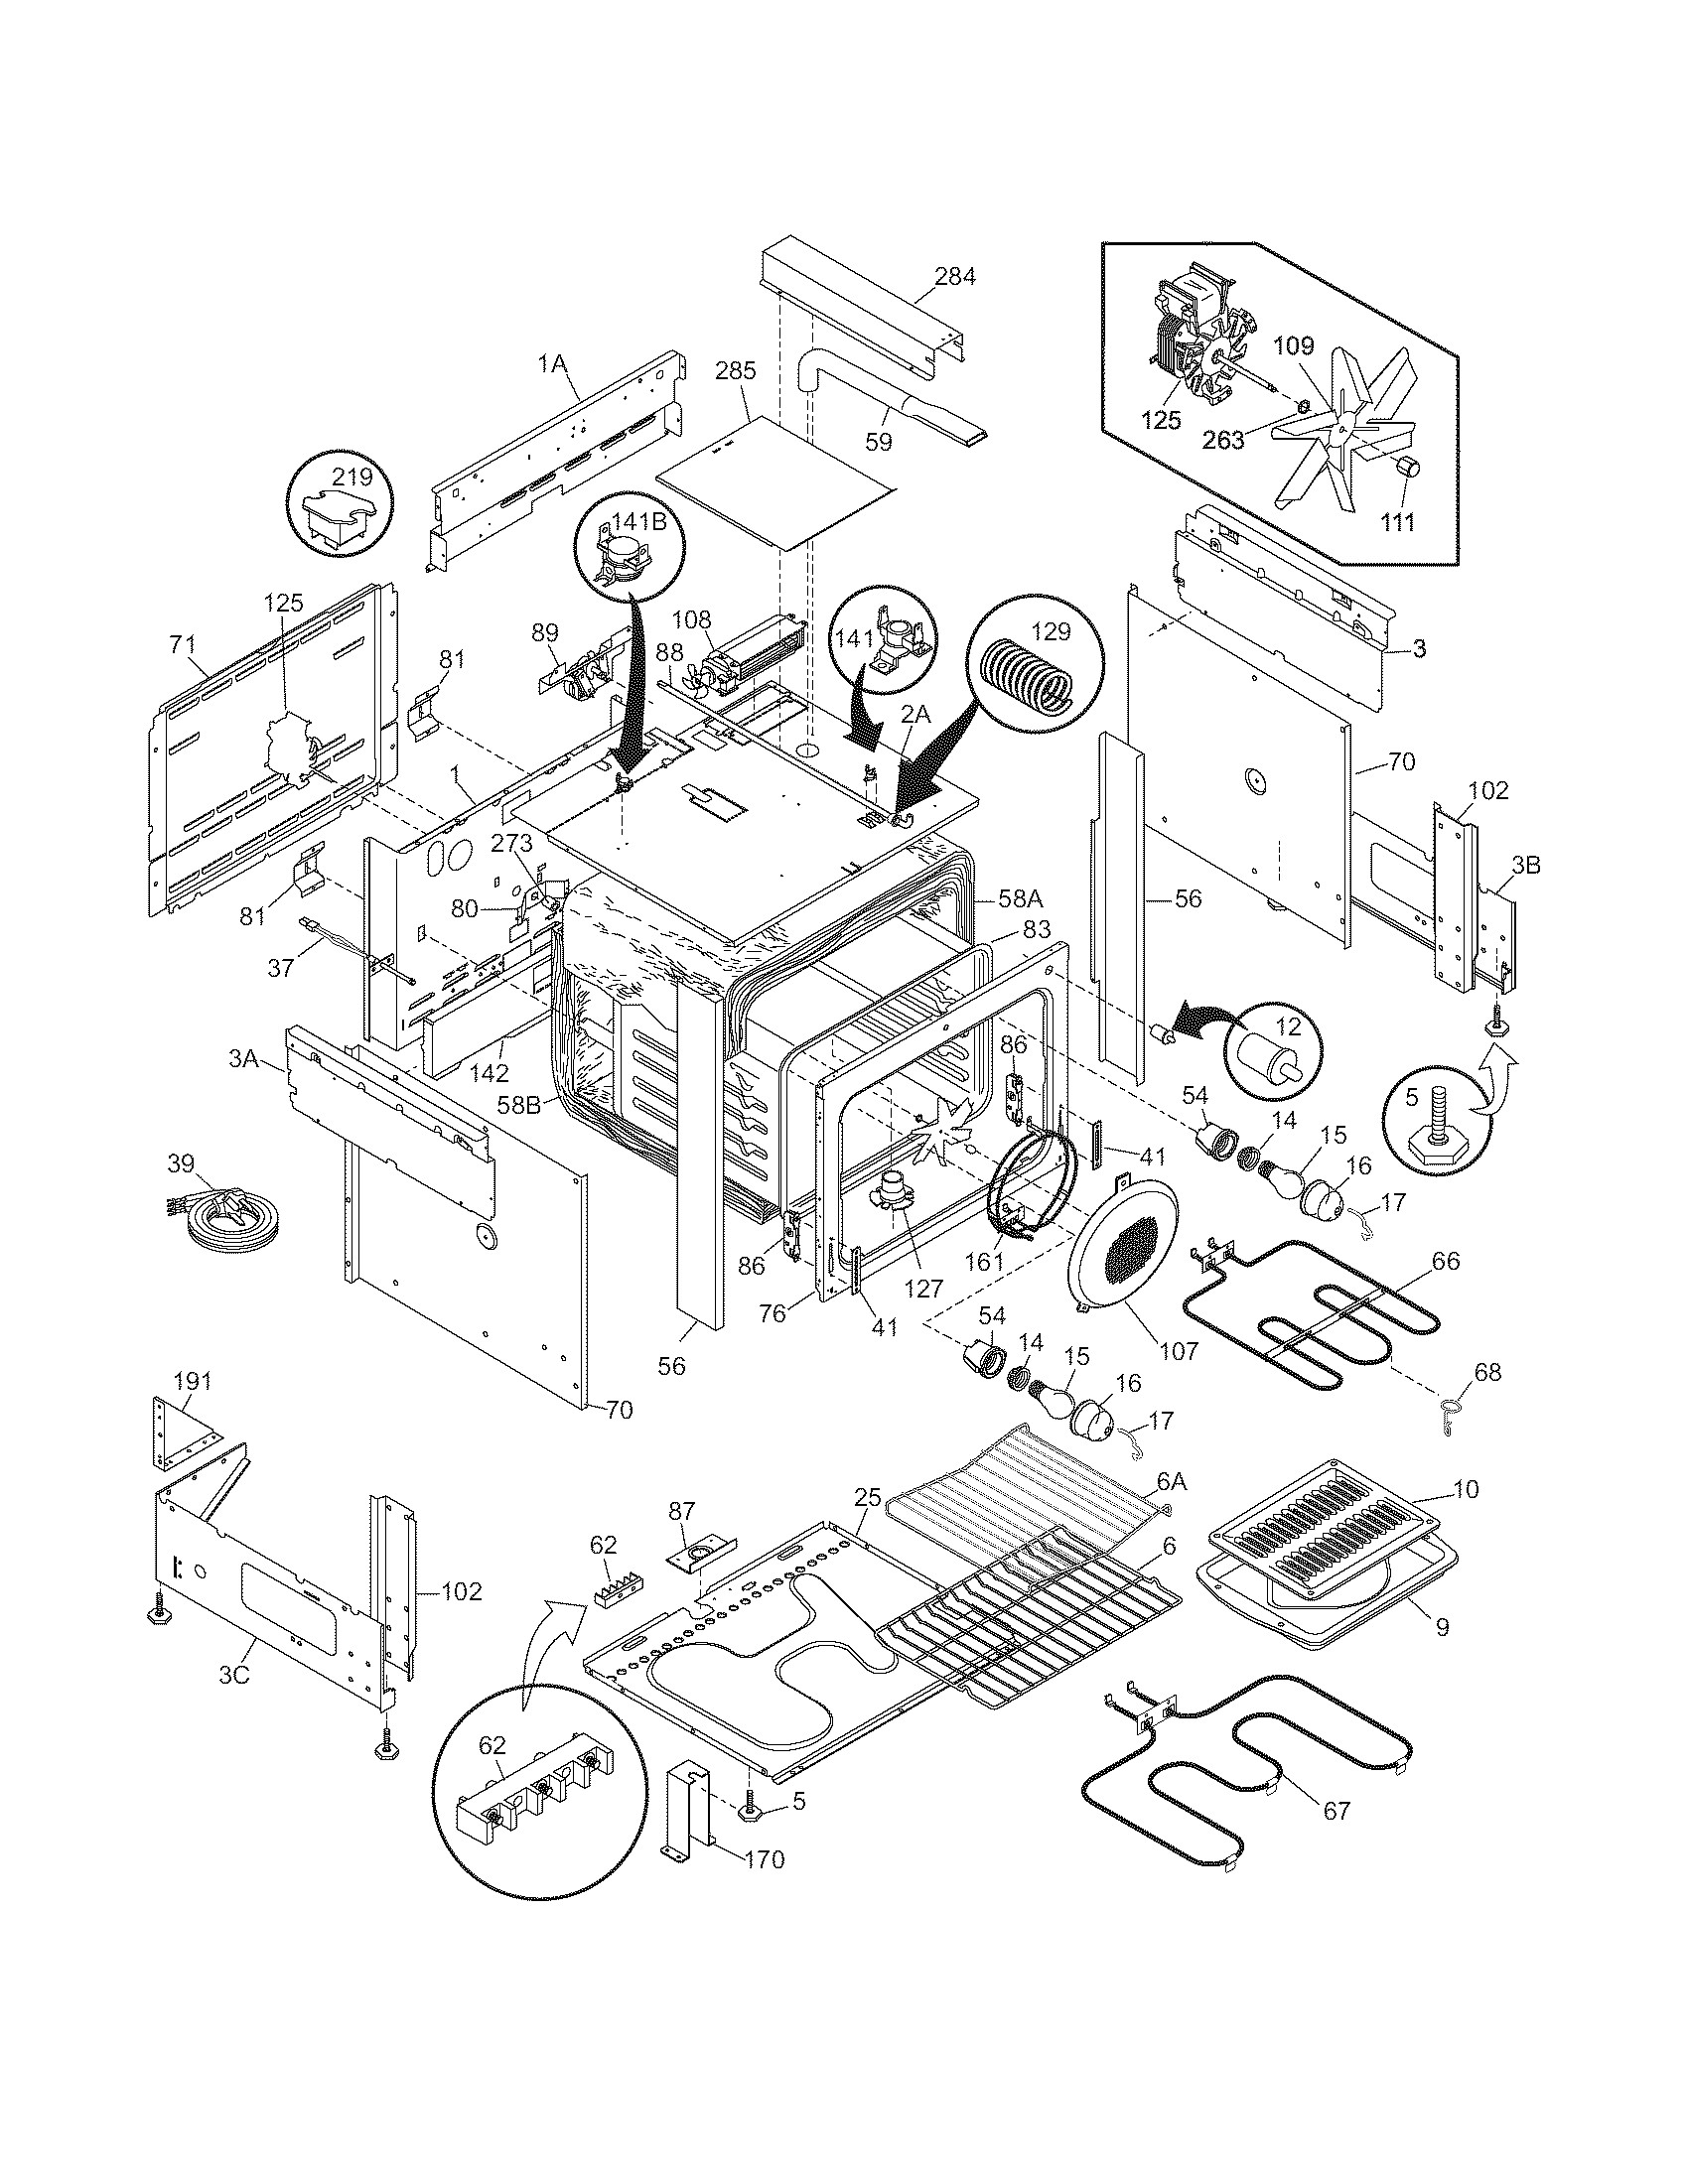 Frigidaire Gallery Dishwasher Parts Diagram Mid Century Modern Whirlpool Dryer Parts Redesigns Your Home with Of Frigidaire Gallery Dishwasher Parts Diagram